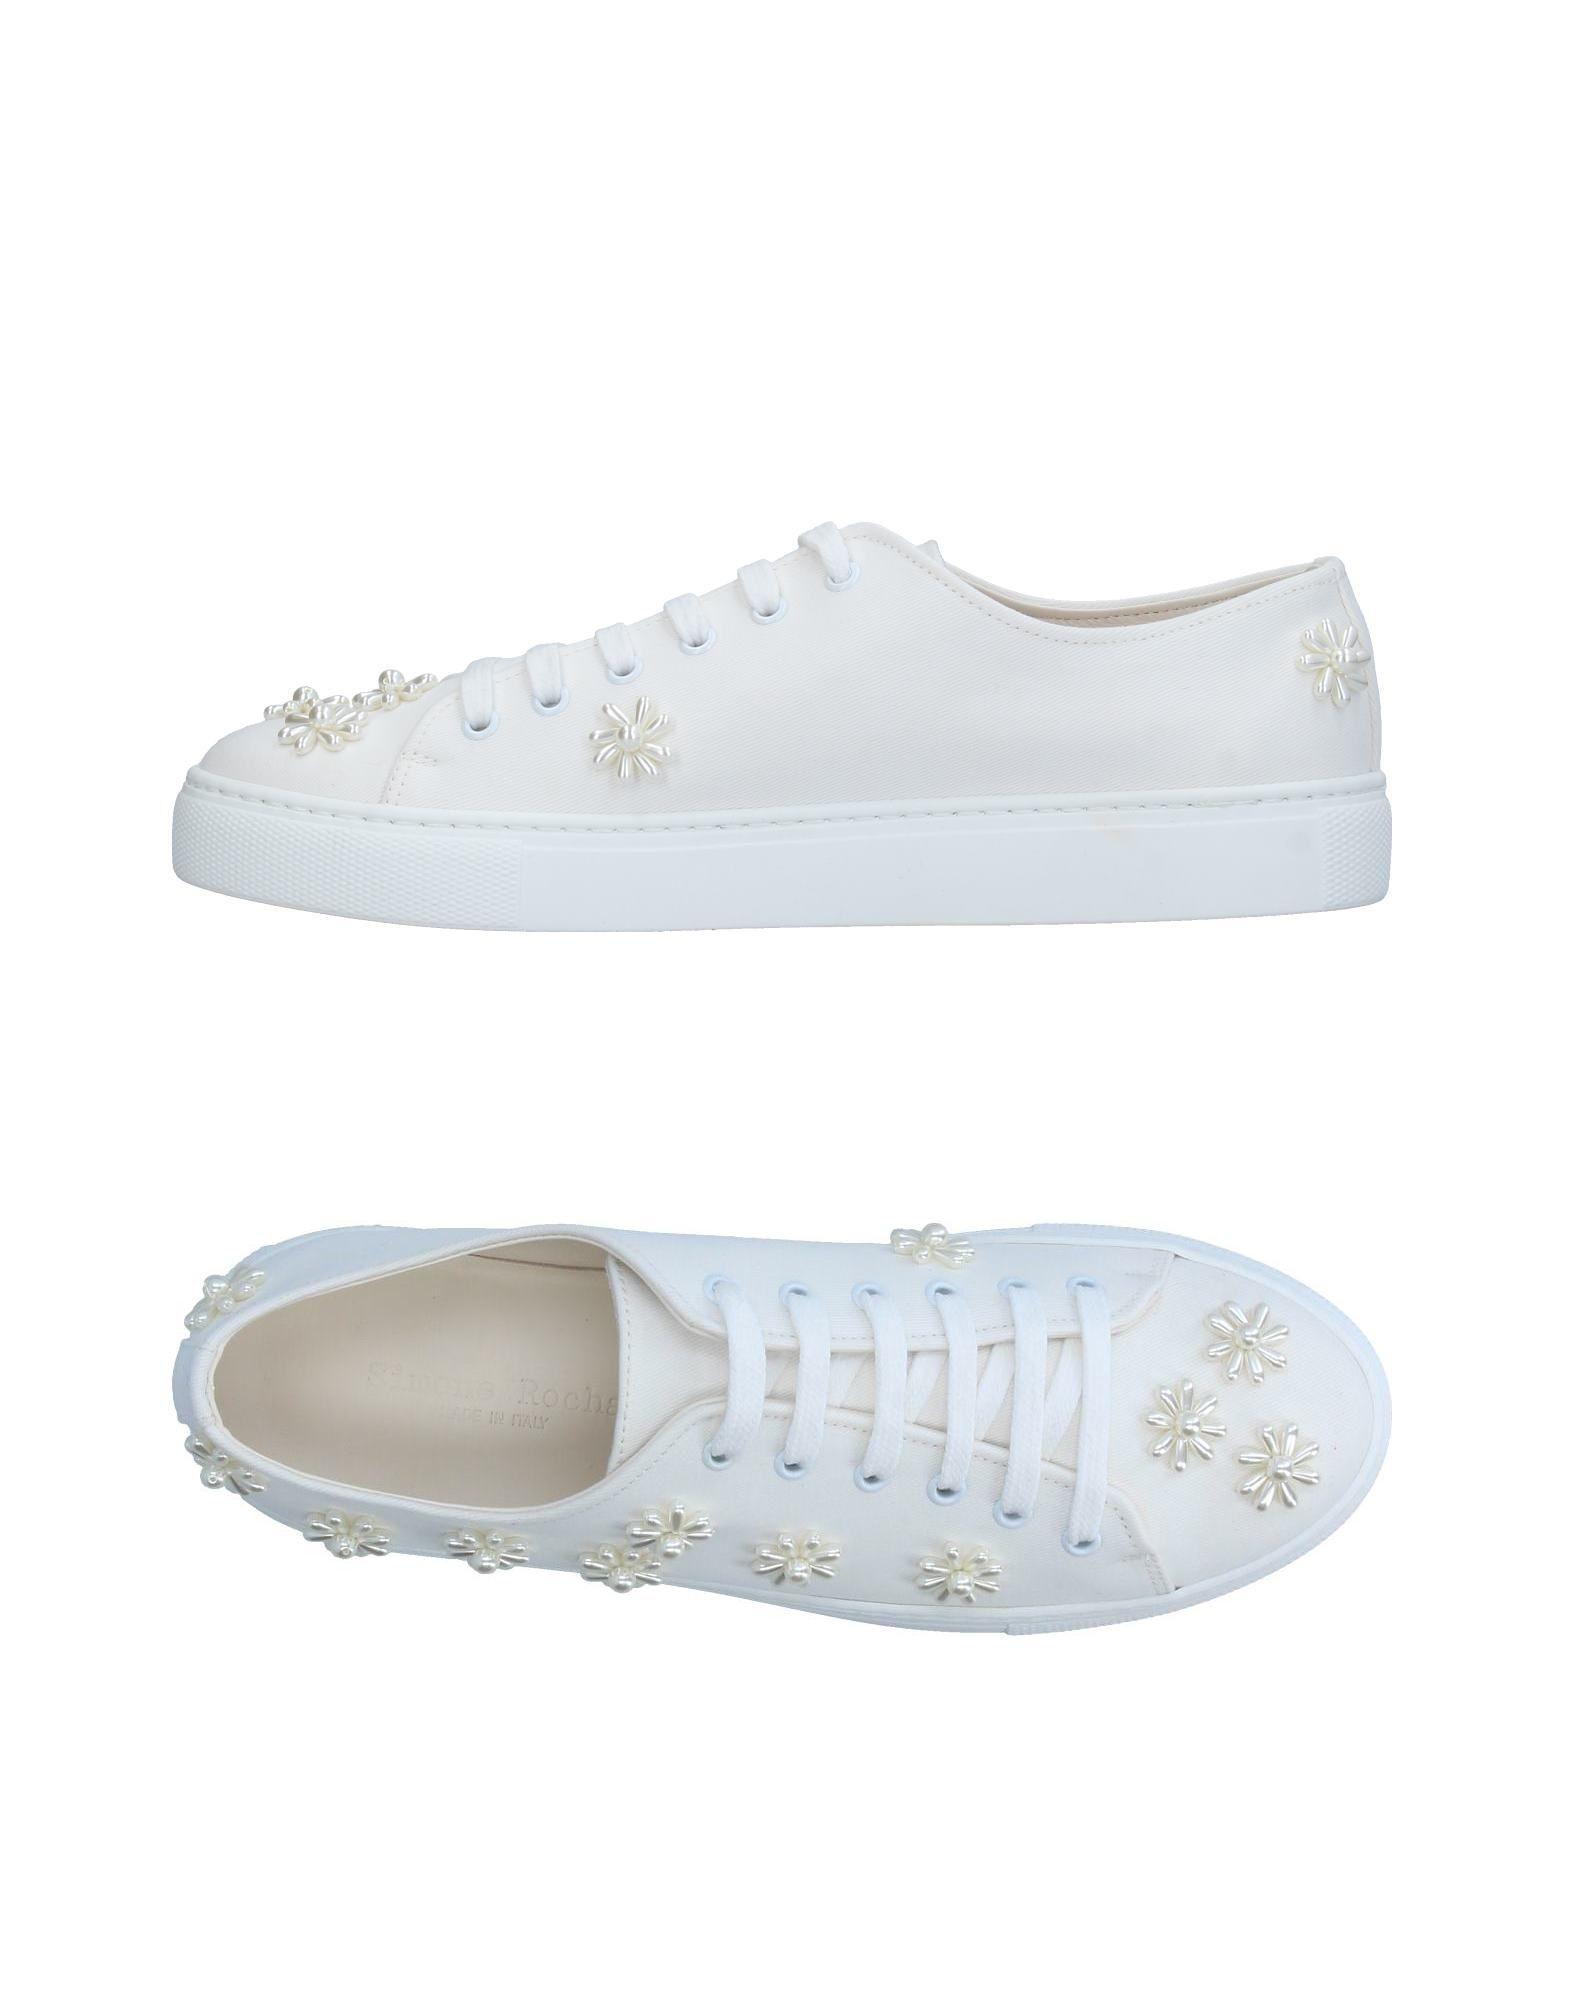 Stilvolle billige Schuhe Simone Rocha Sneakers Damen  11337711VU